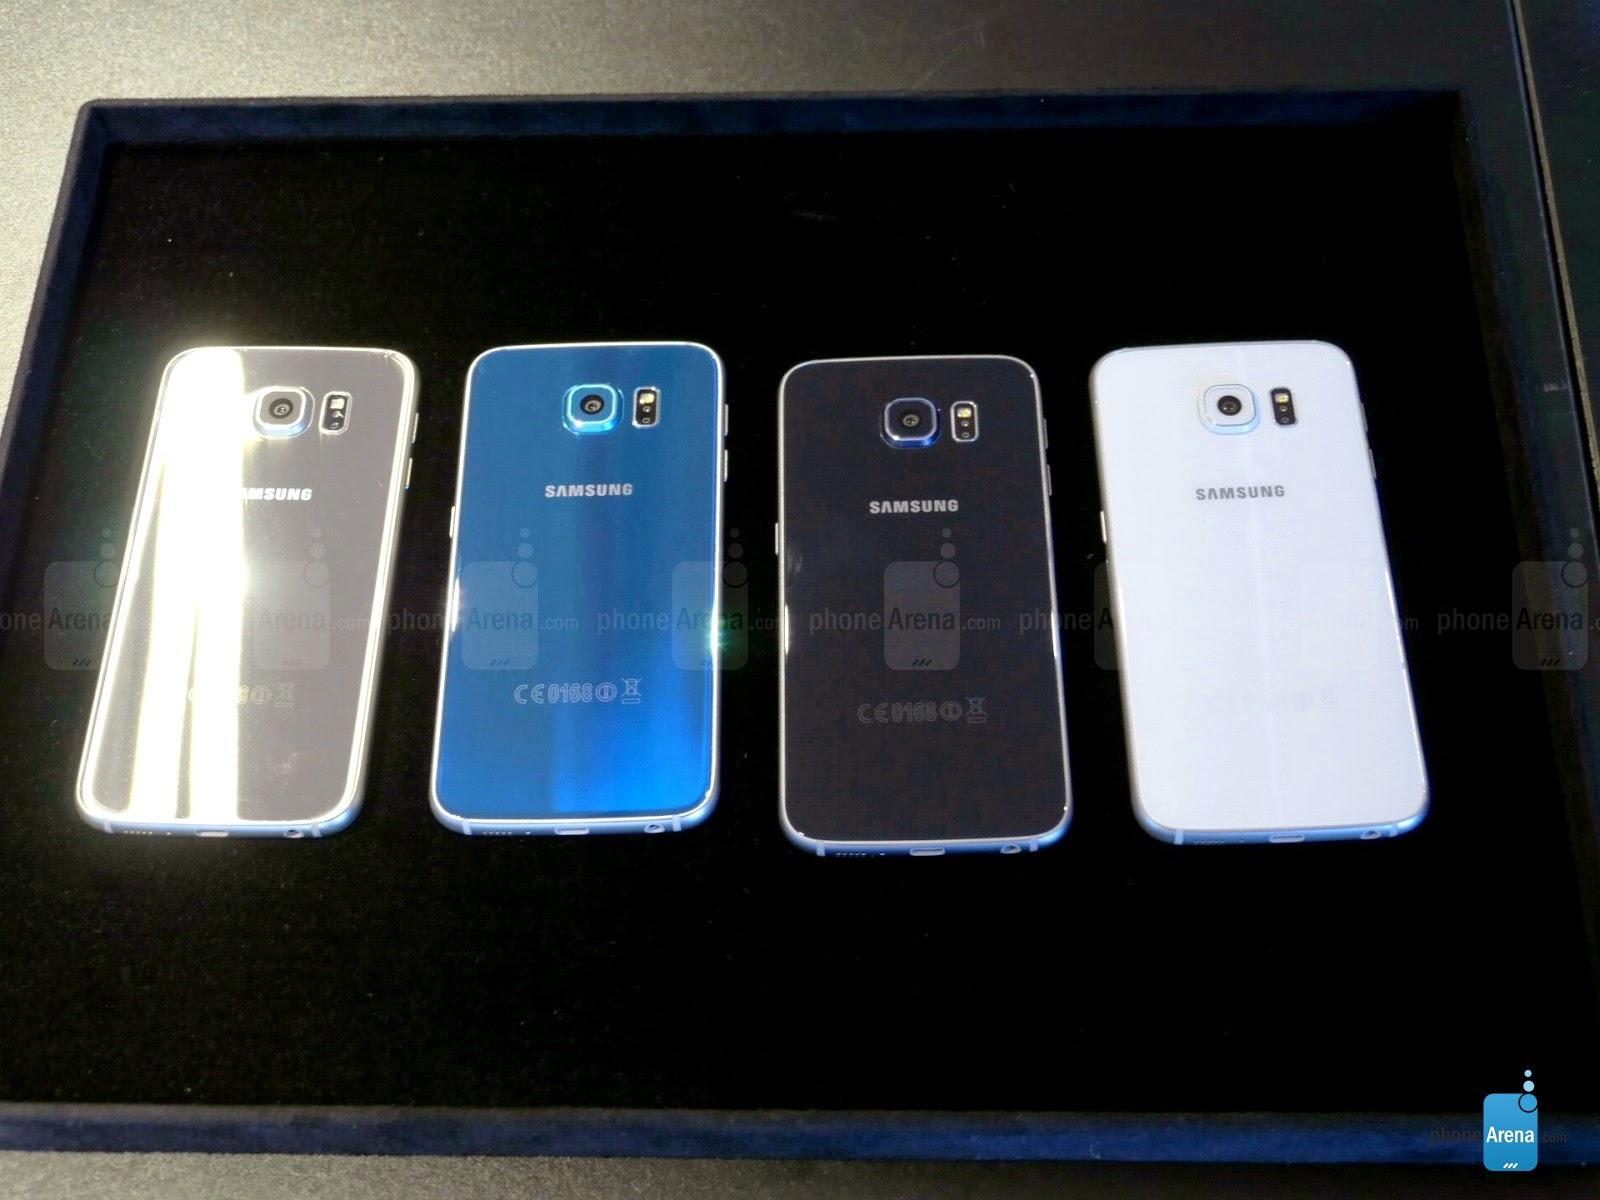 Samsung Galaxy S6 hands-on - T Best mobile phones